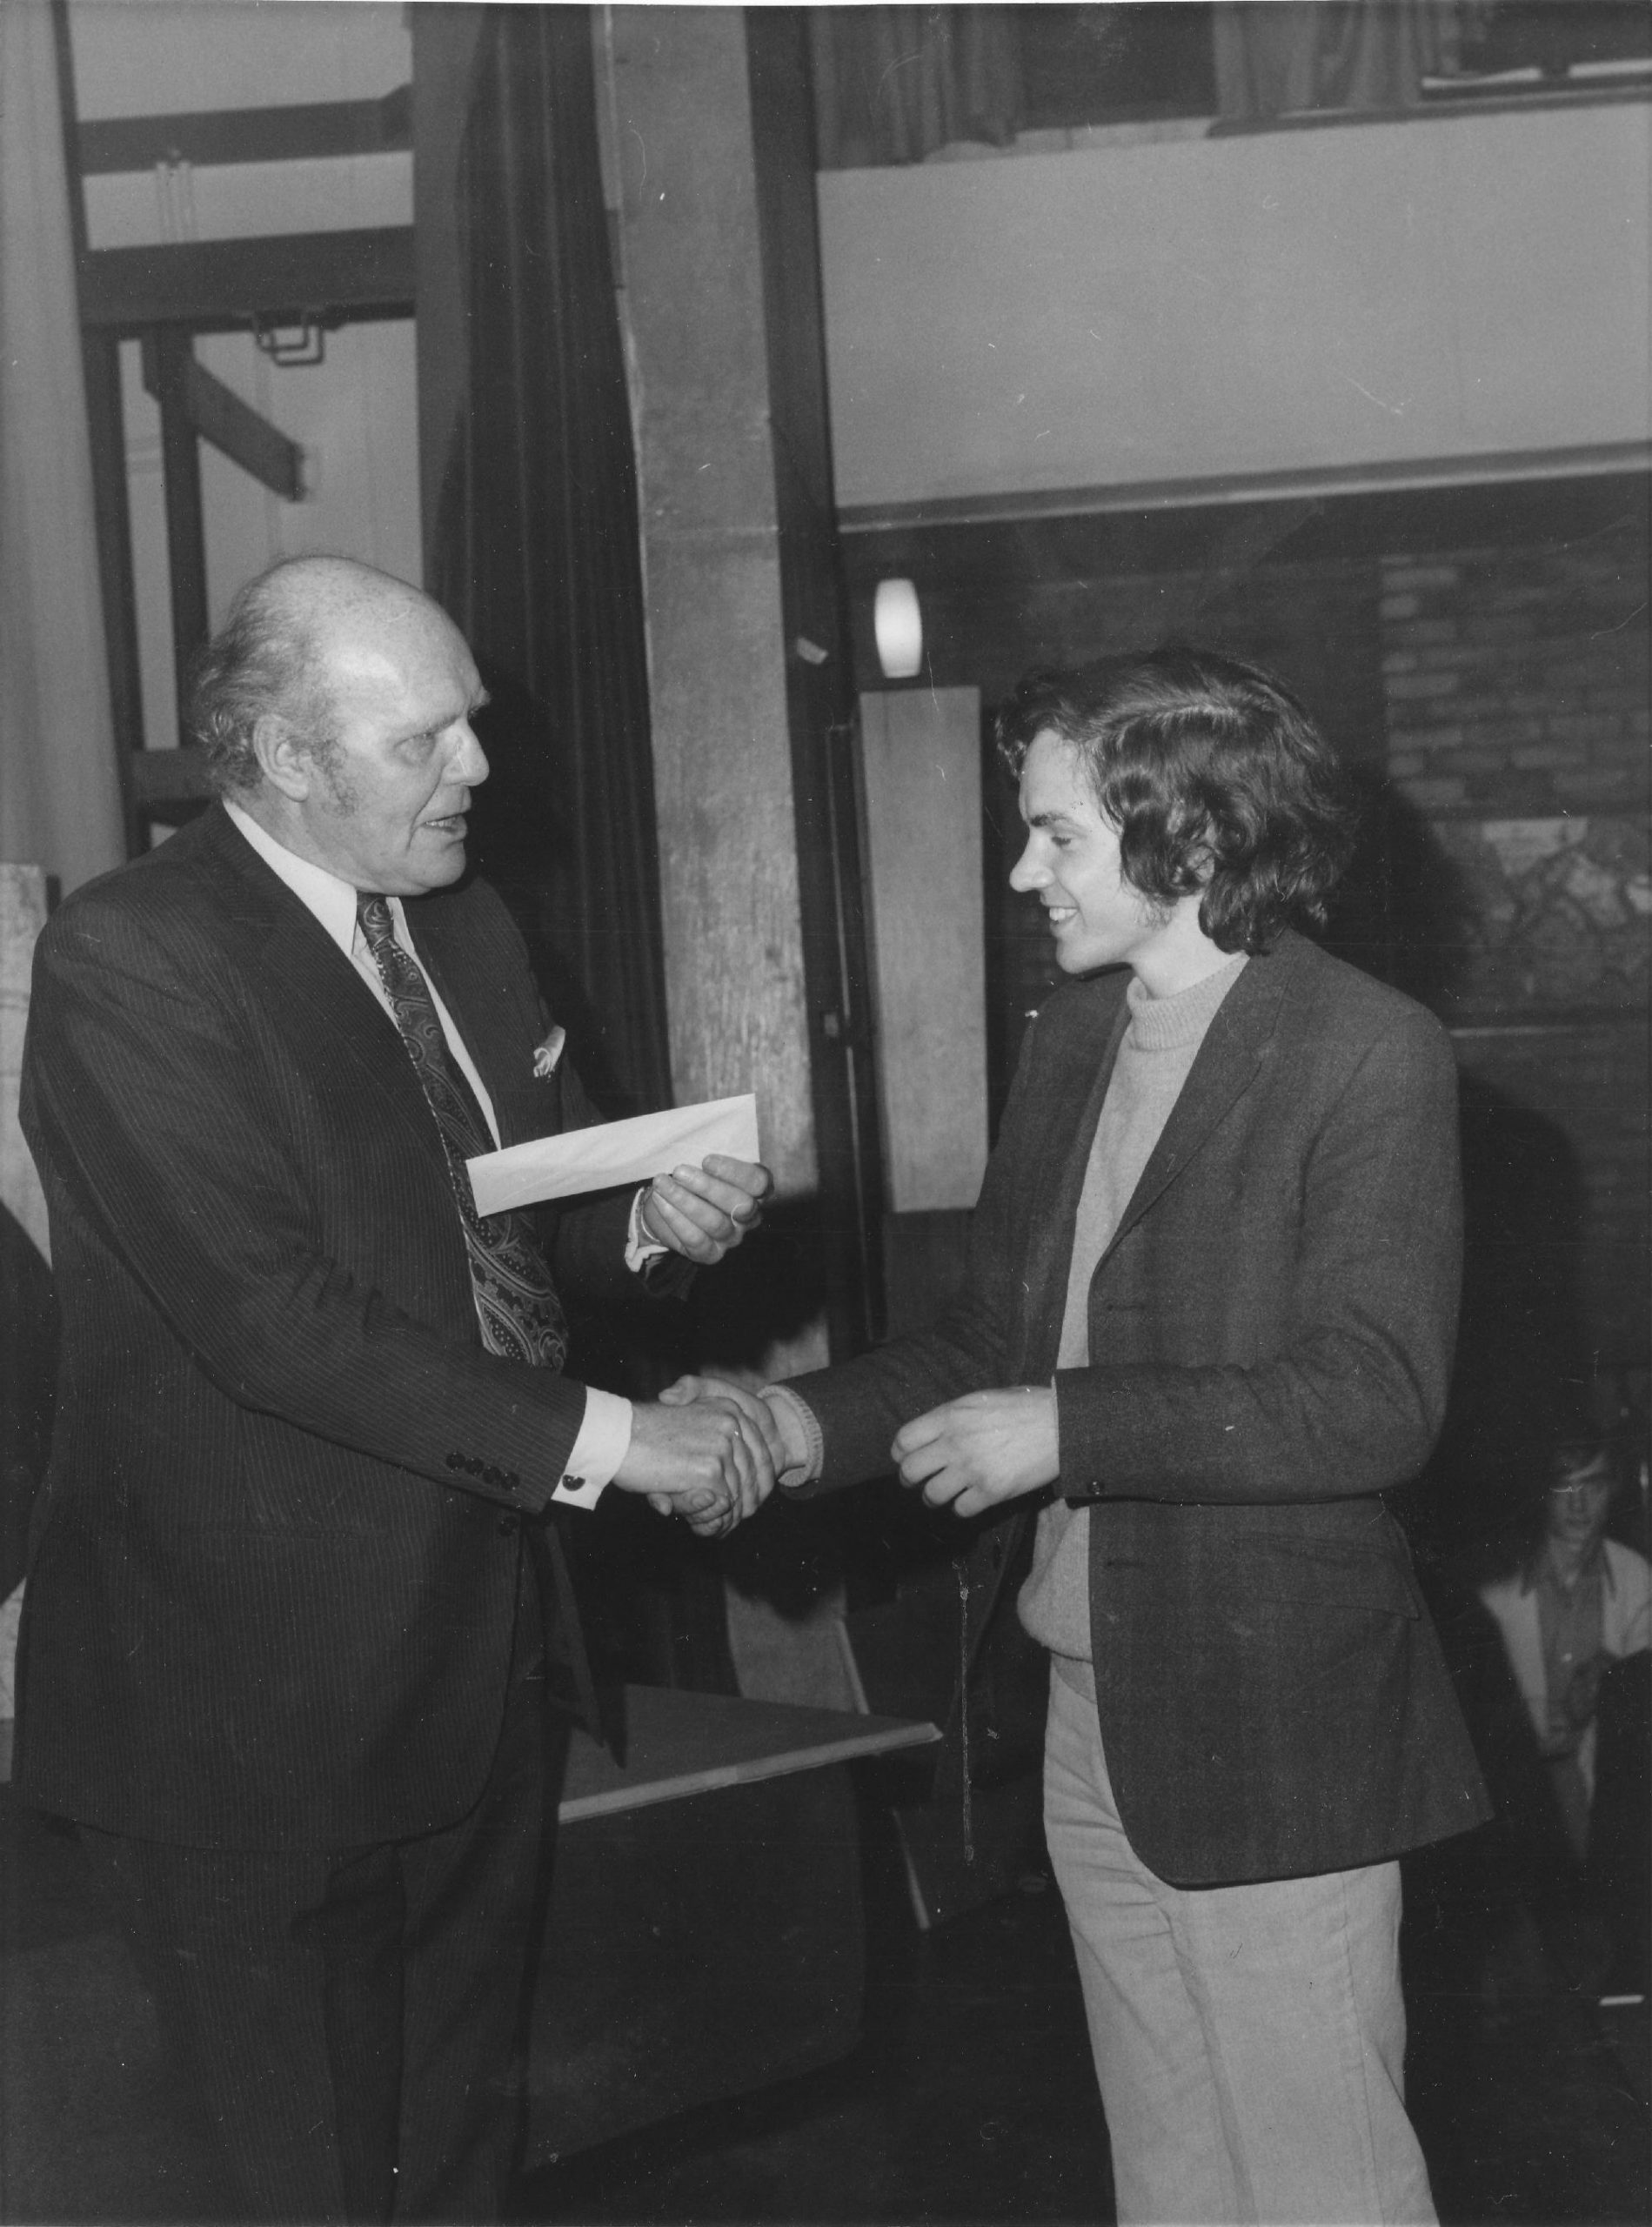 David Nixon and Simon Webb at the London Evening Standard Congress